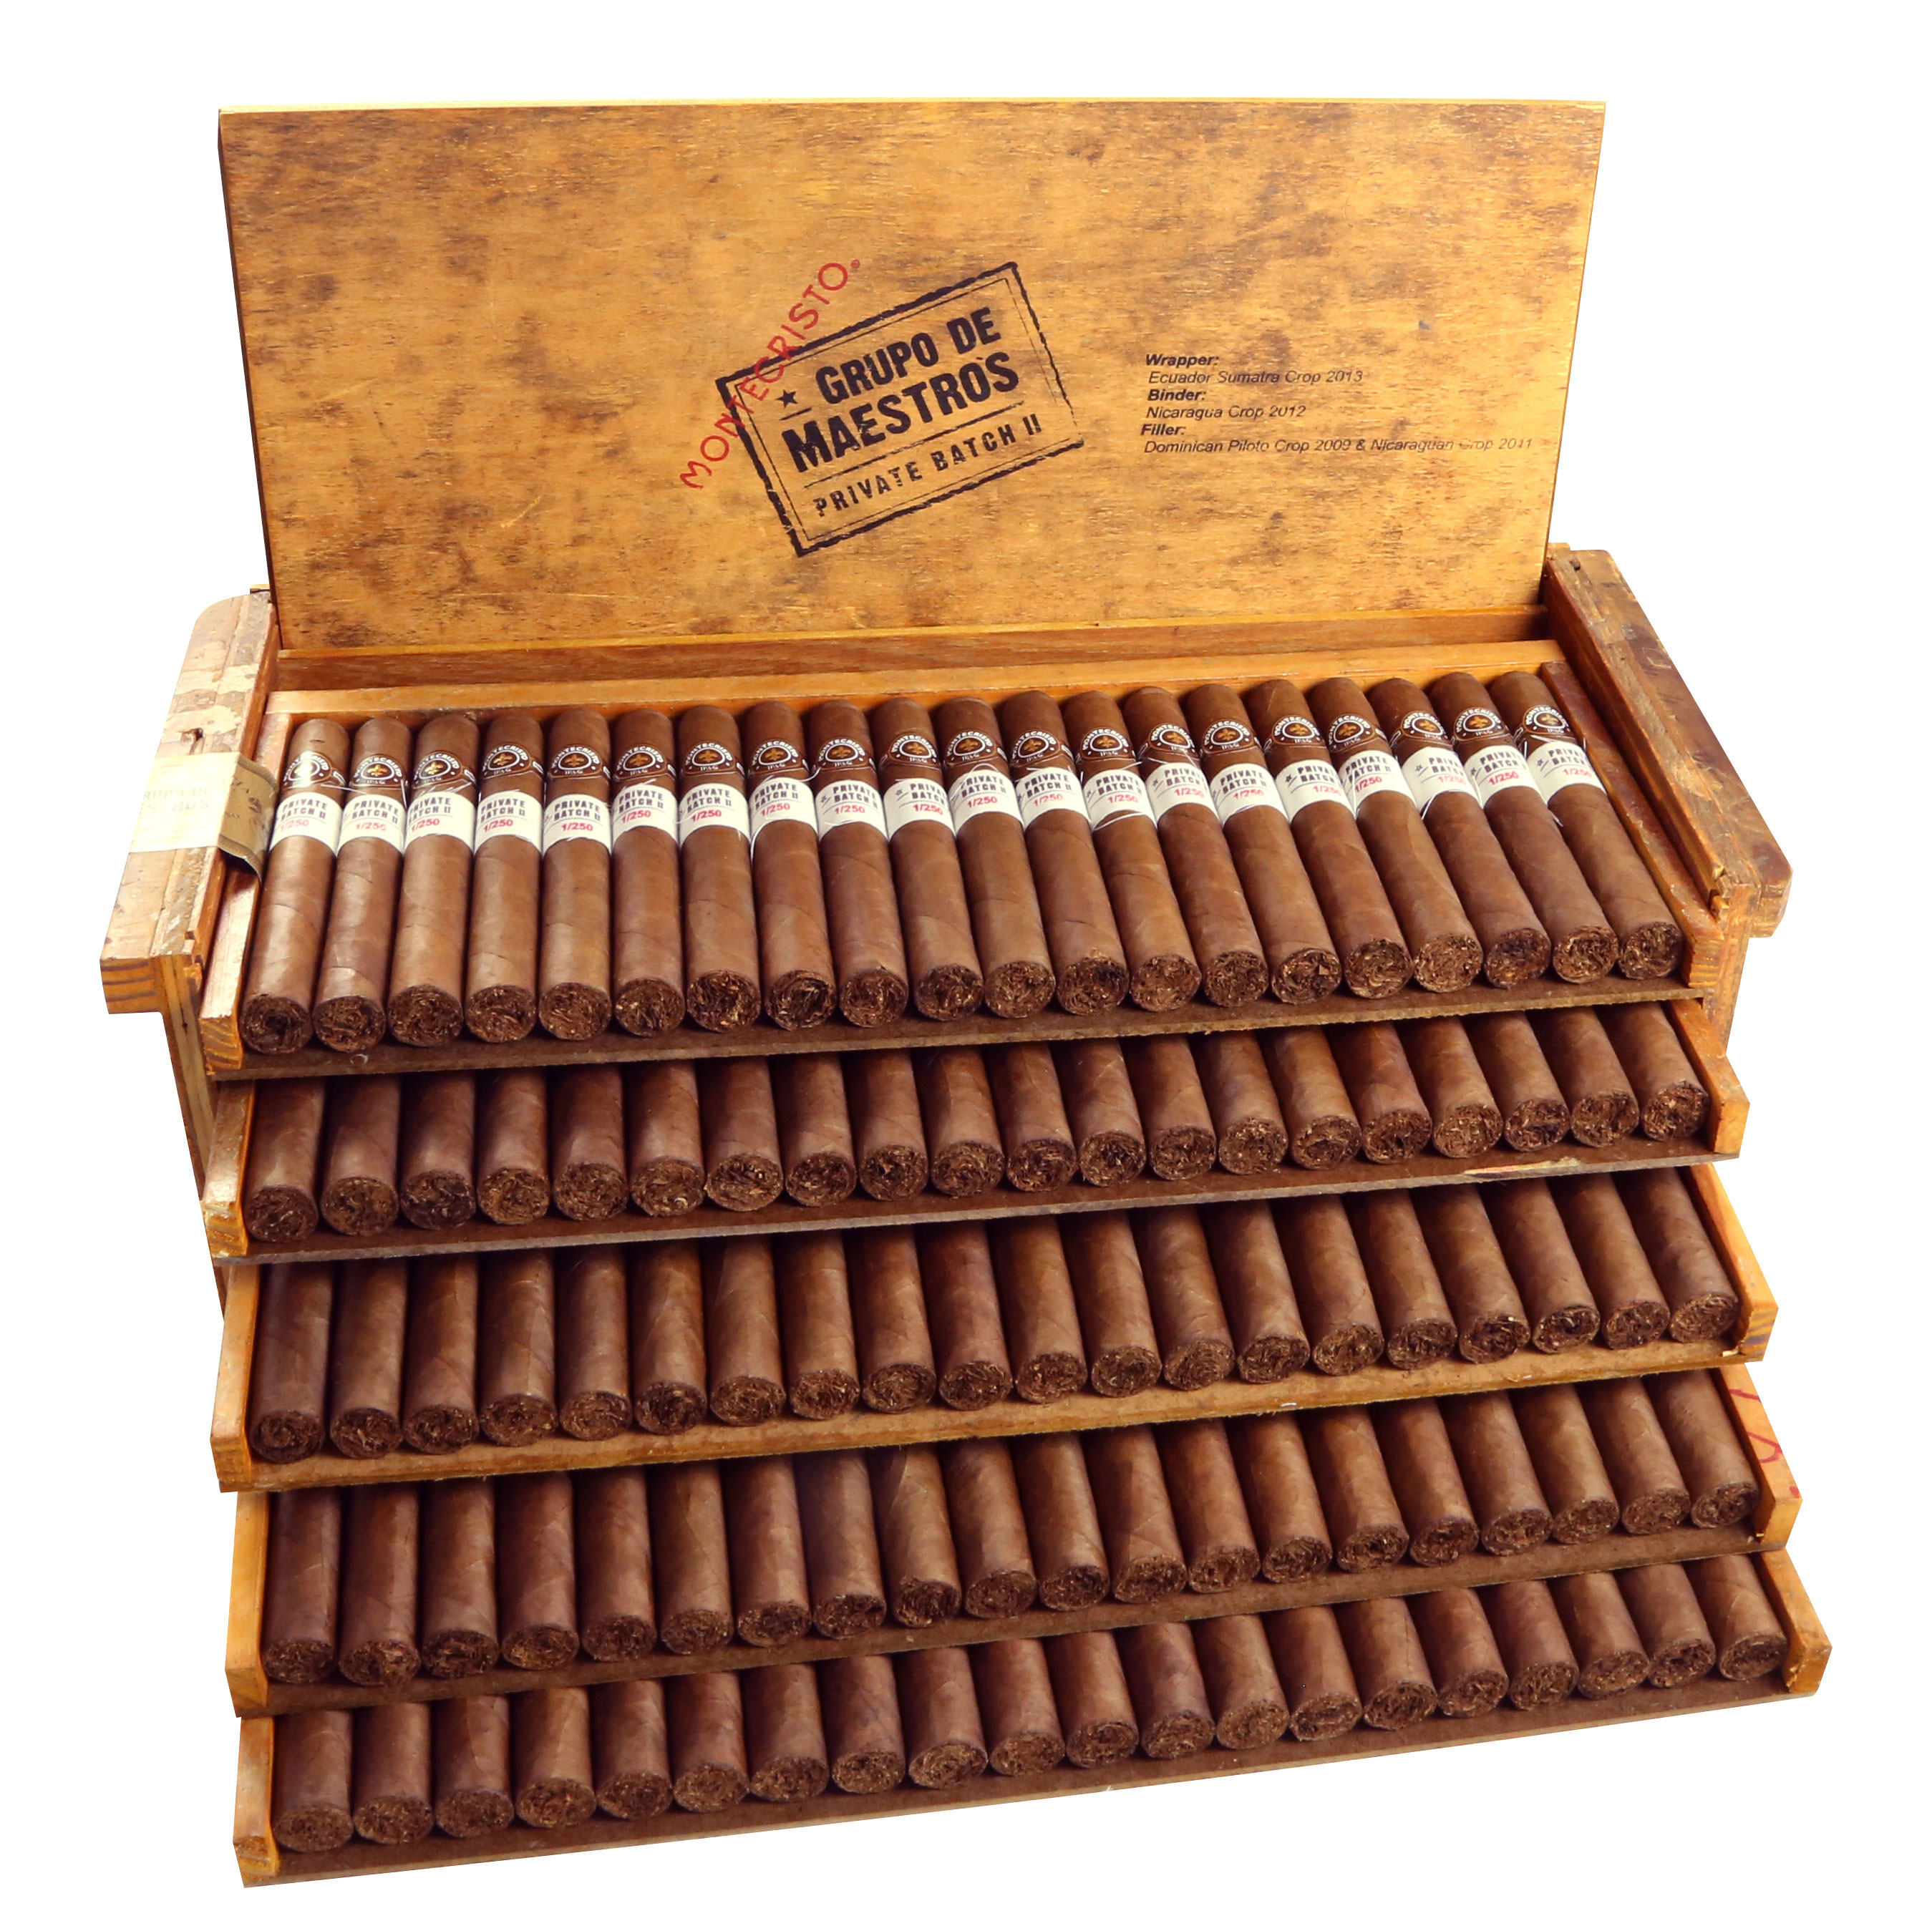 Cigar News: Atladis Announces Montecristo Grupo de Maestros Private Batch II